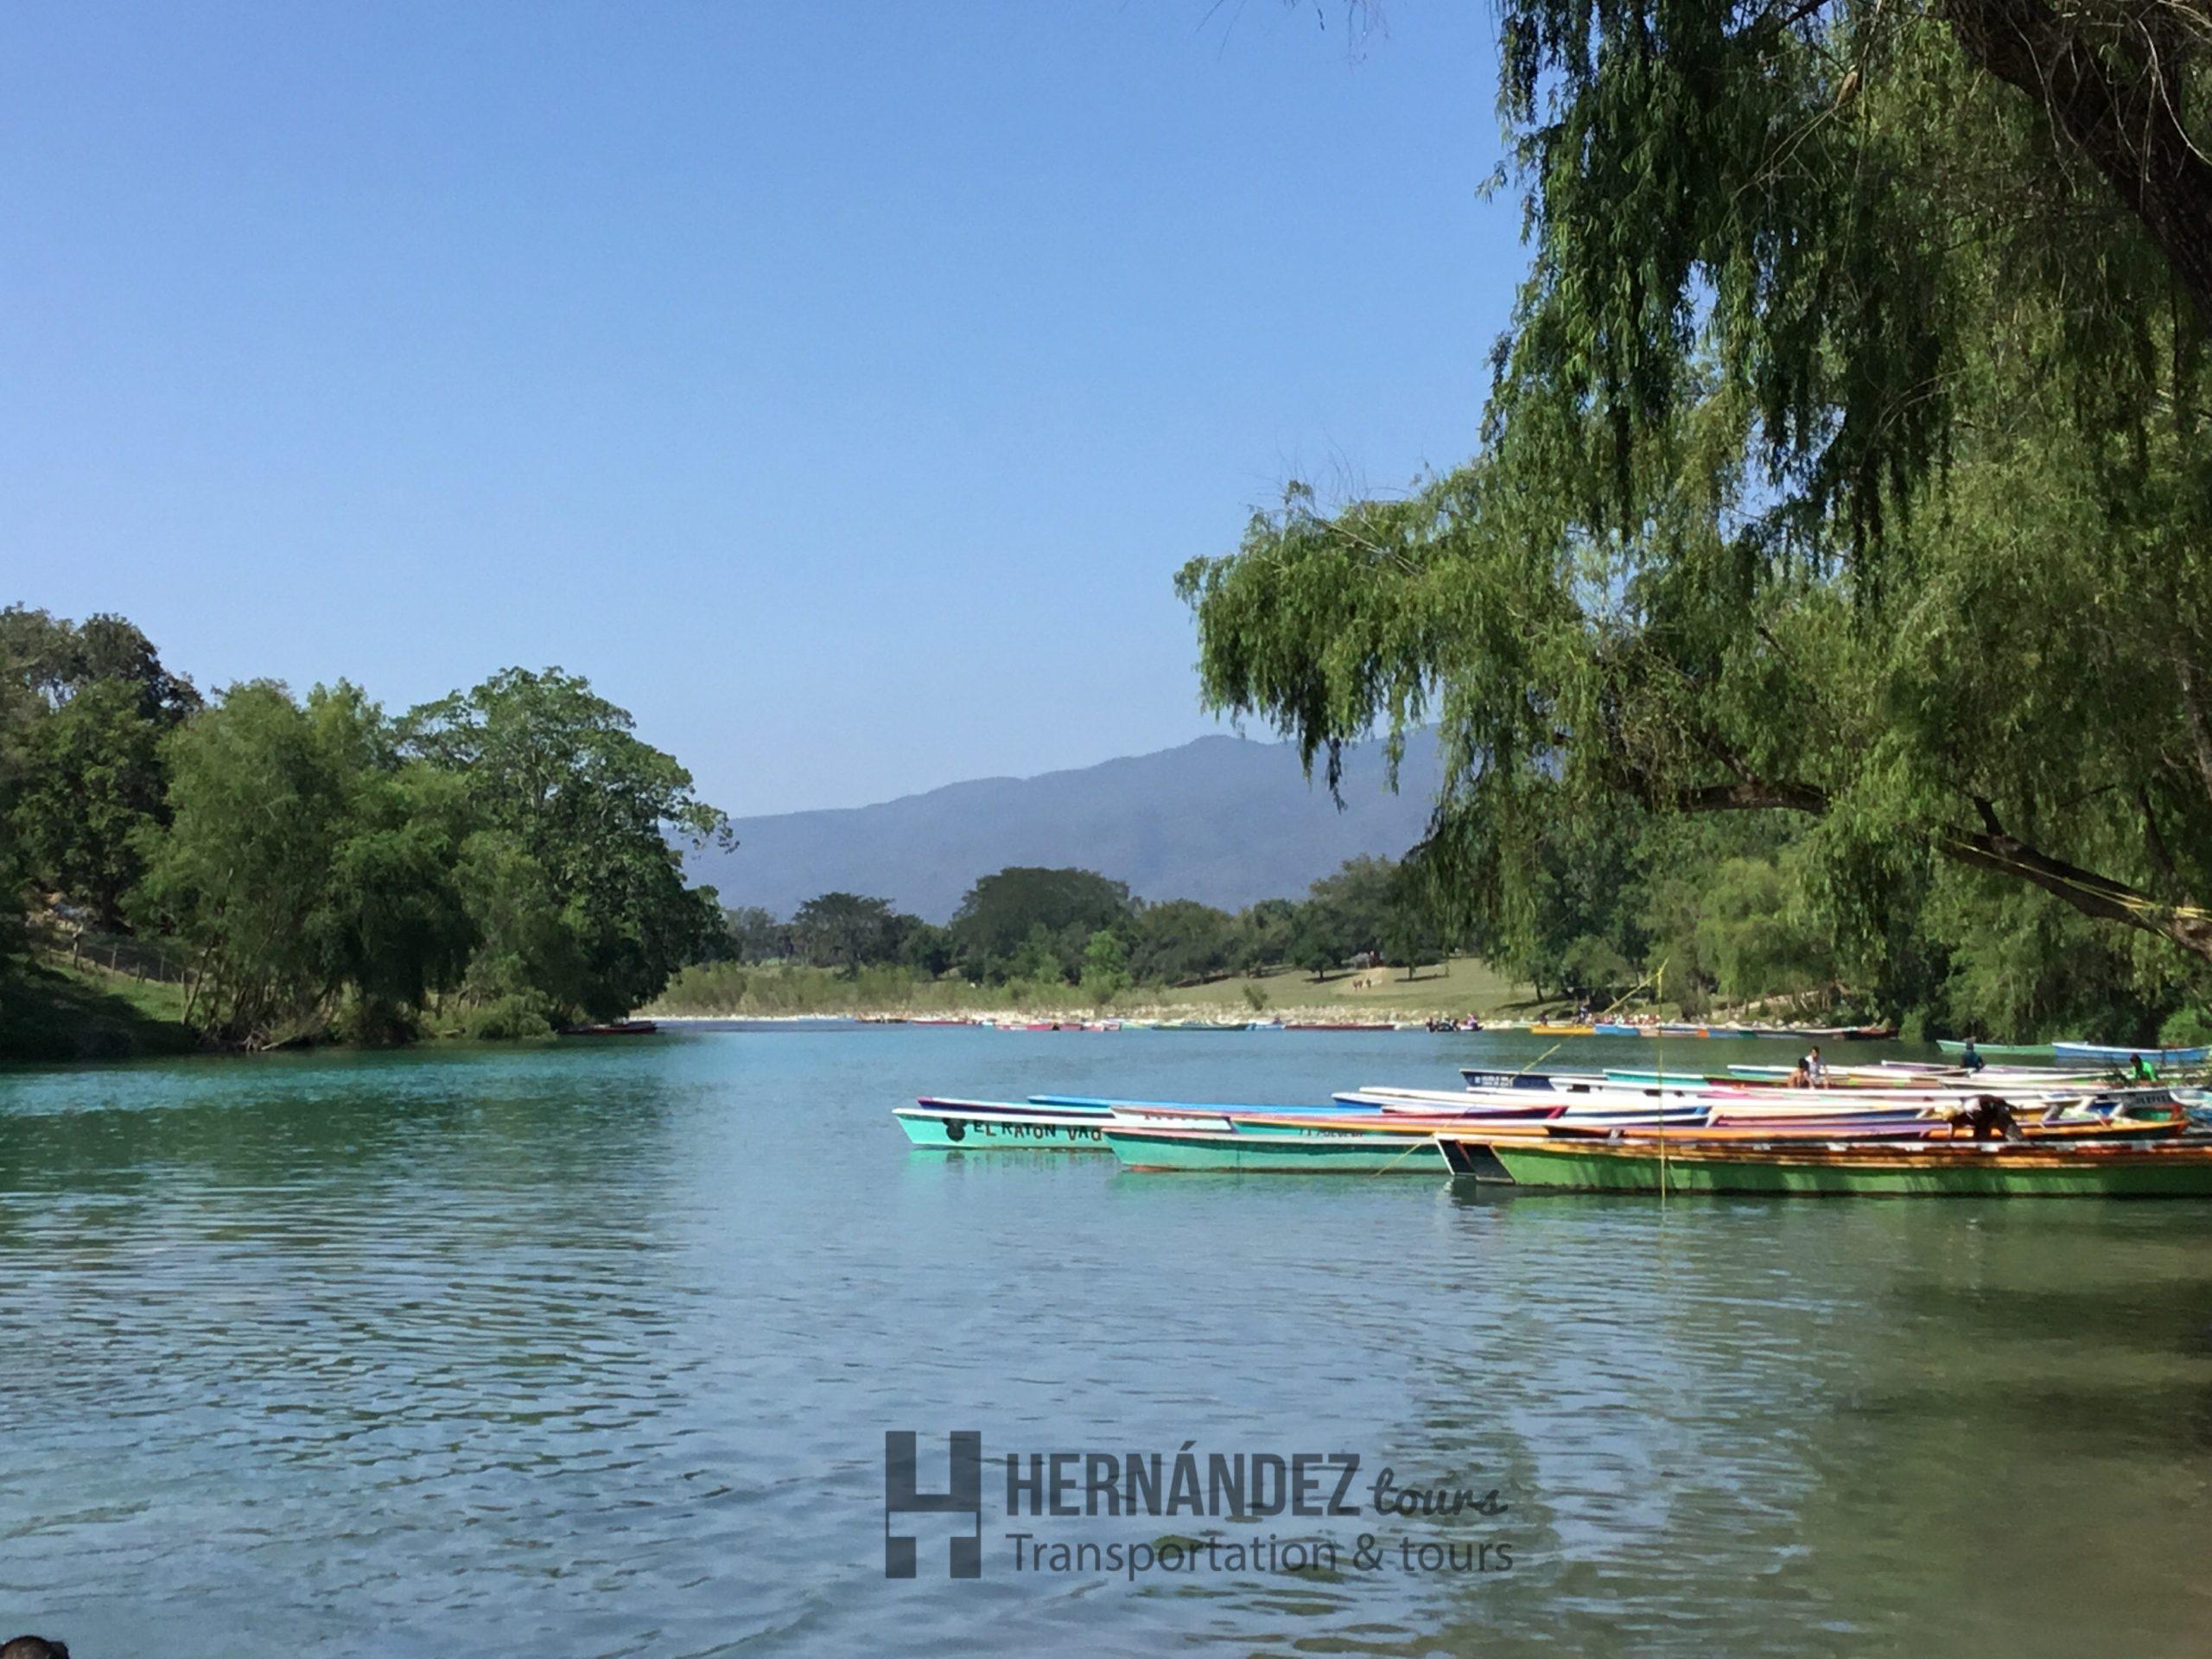 Hernandez_TourIMG_1290